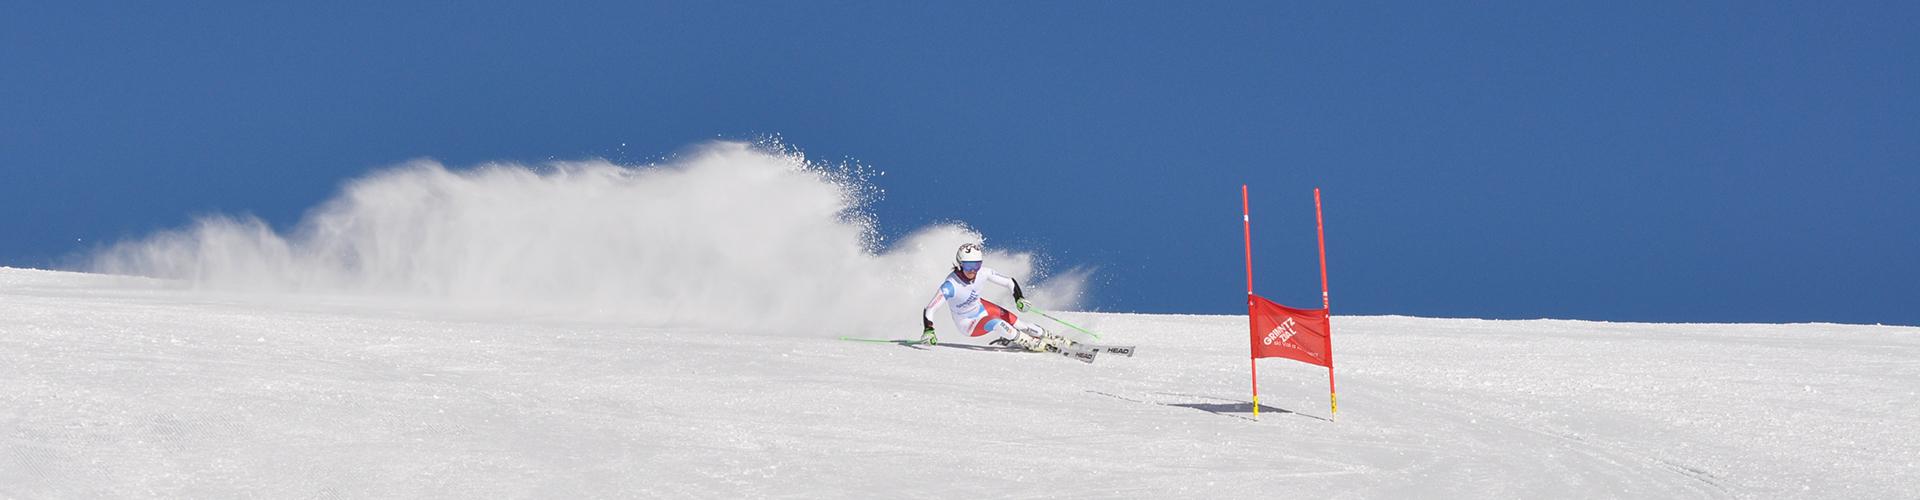 Camille Rast ski alpin géant Zinal